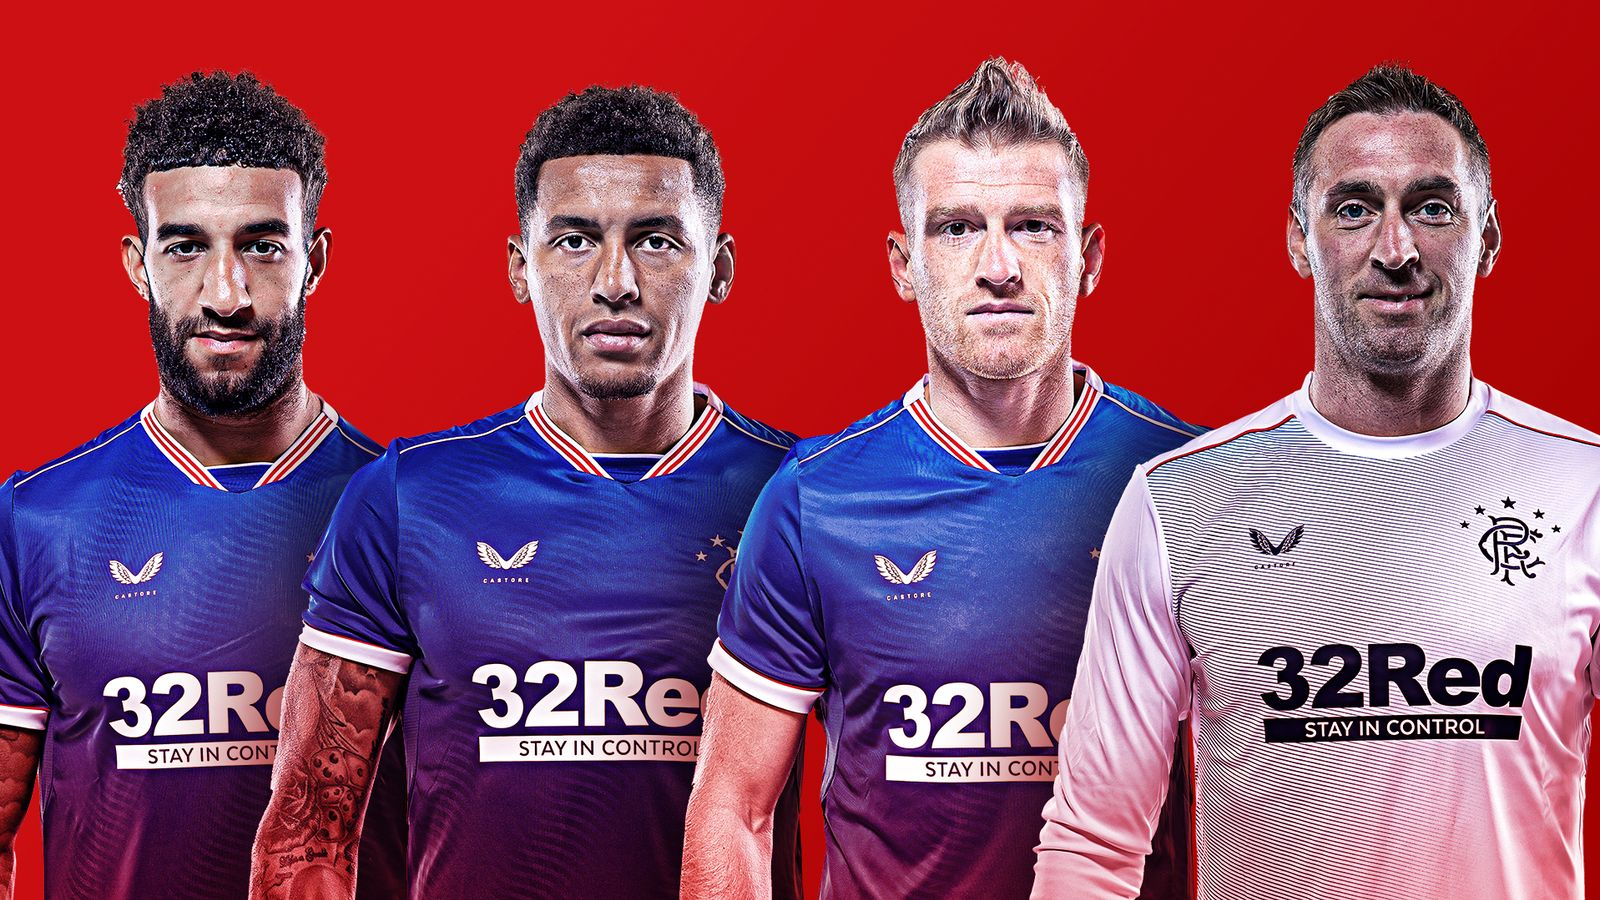 Rangers dominate Scottish Premiership Player of the Year 2020/21 shortlist